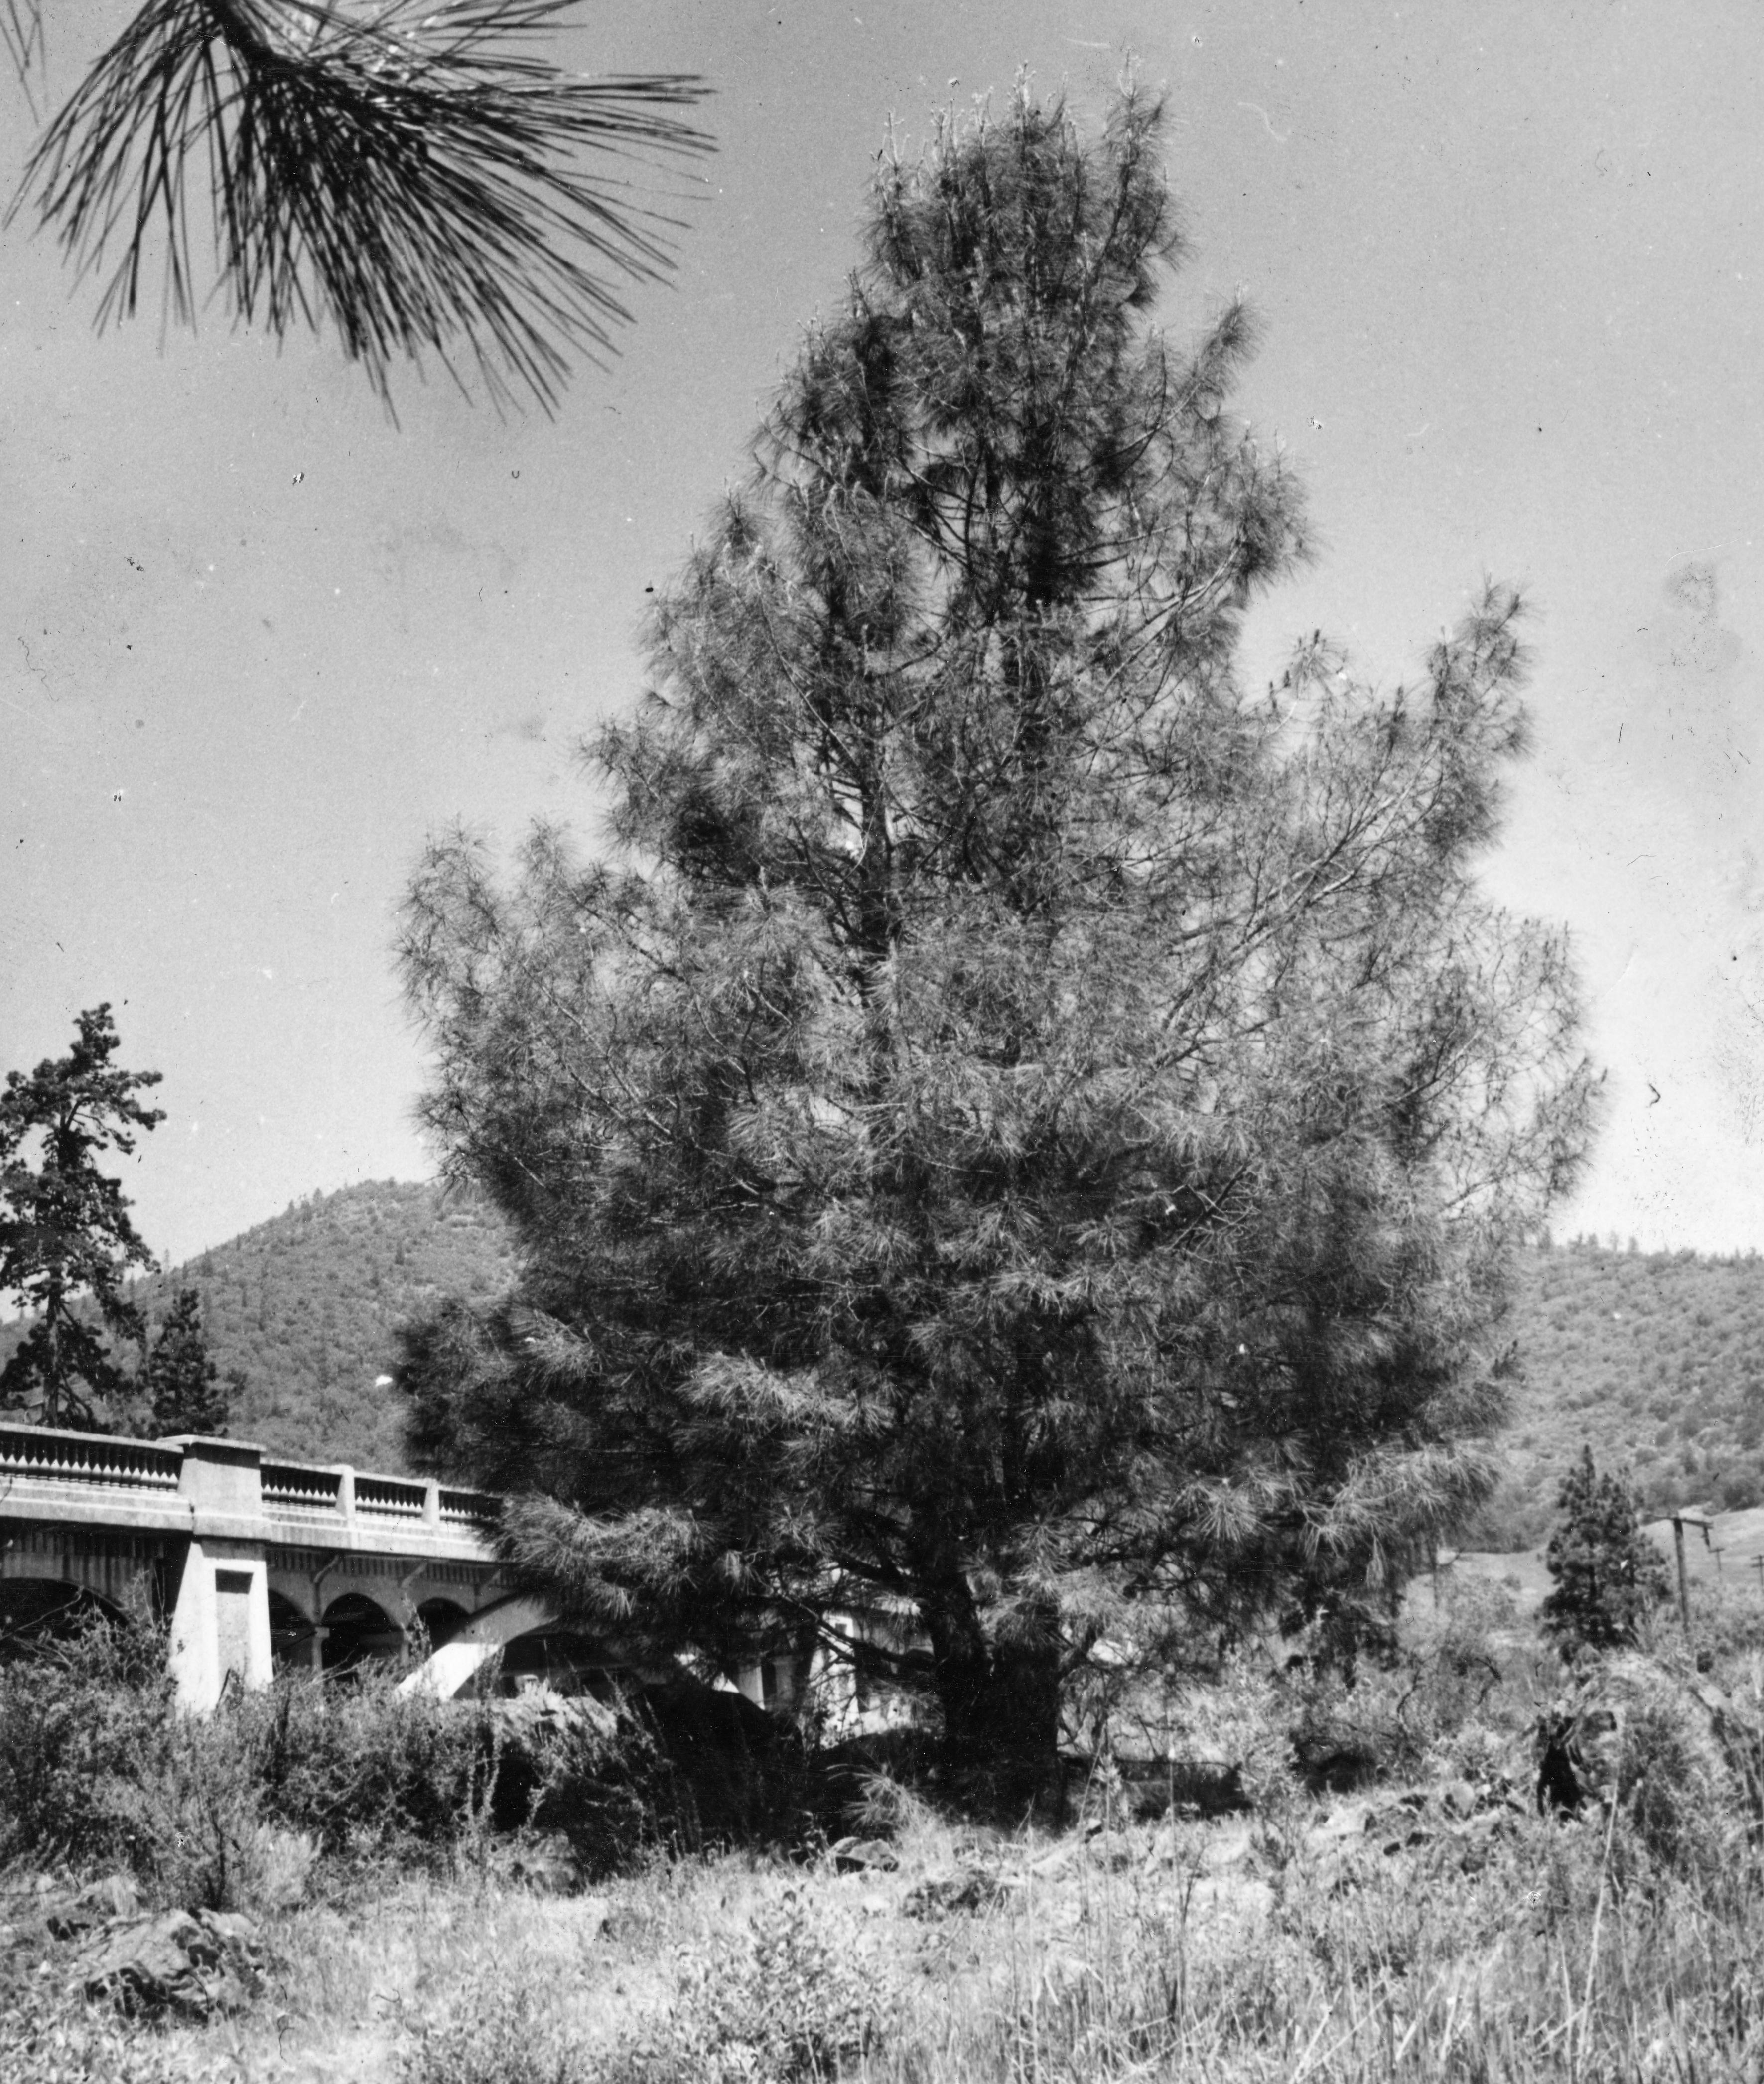 Digger pine tree